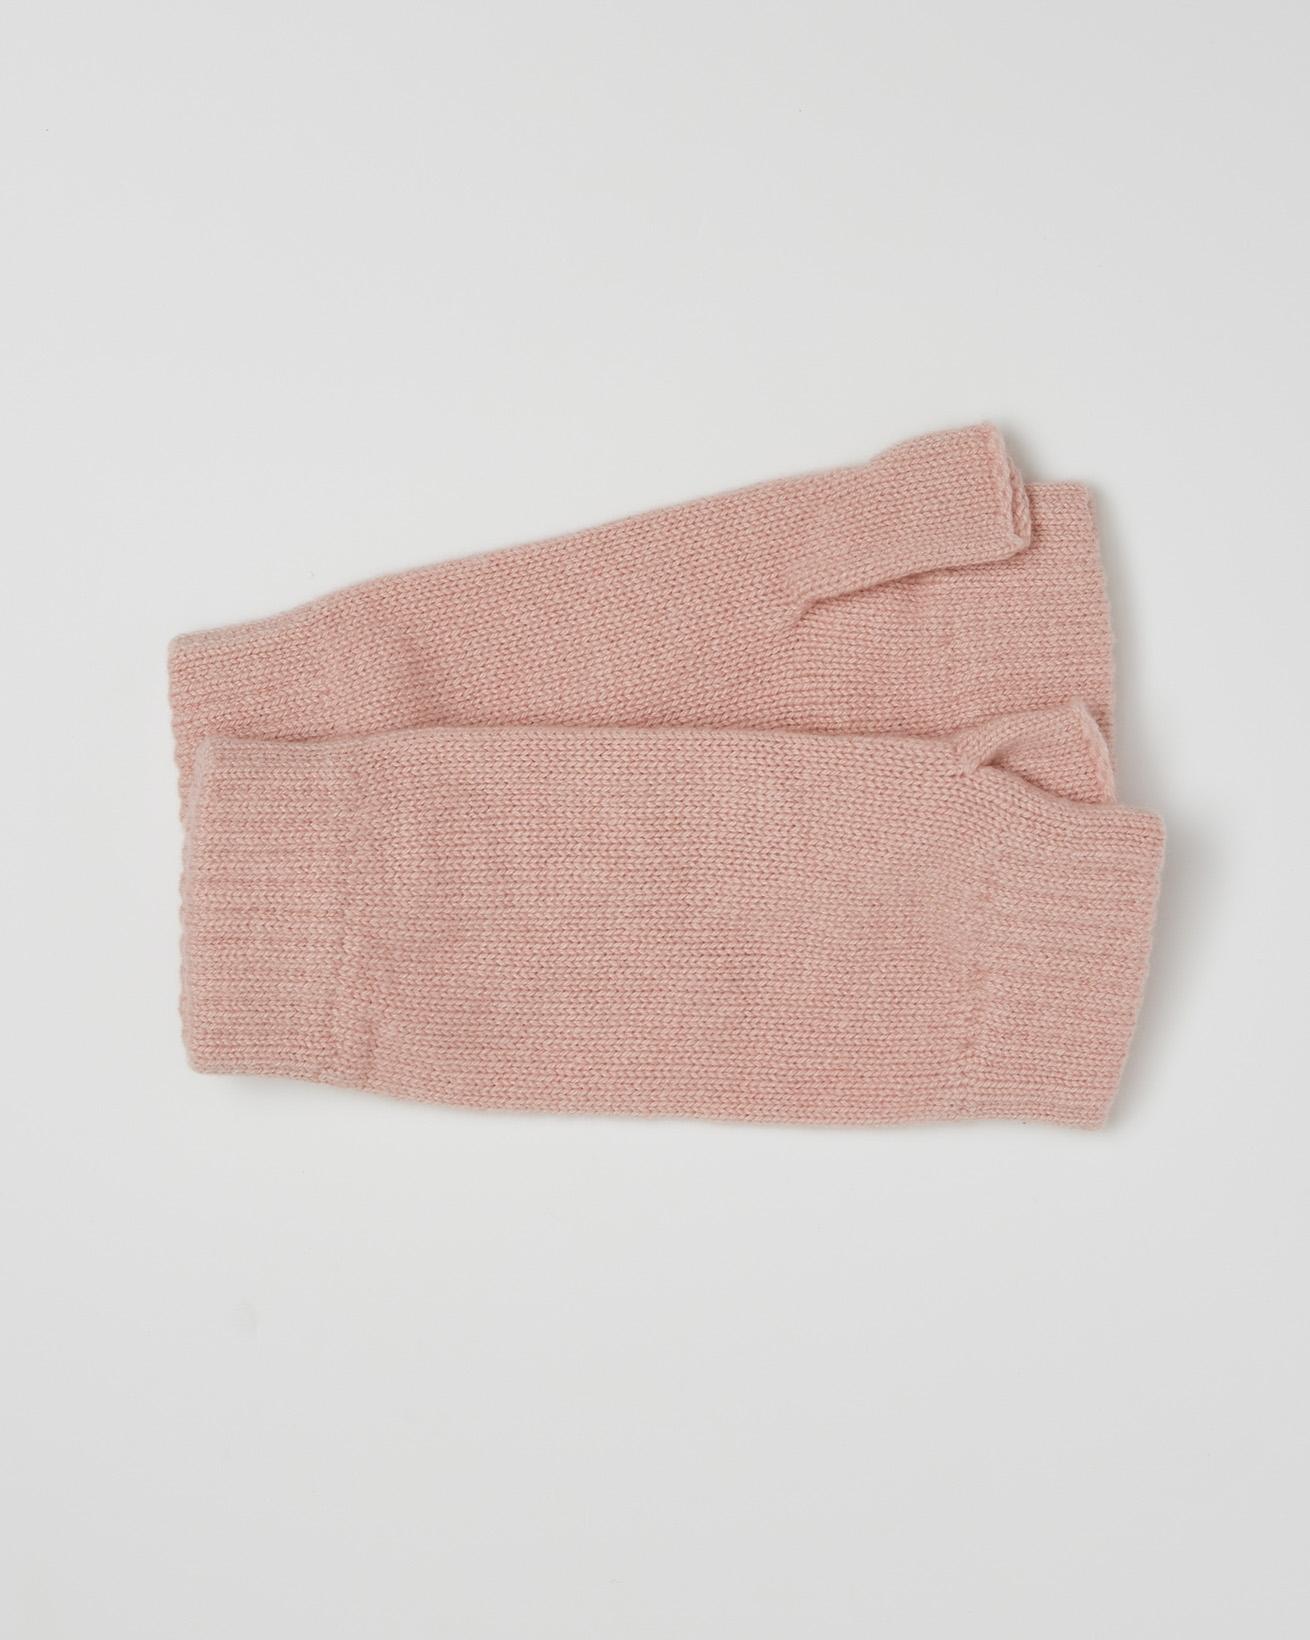 Cashmere Wristwarmers - Pink - One Size - 2616